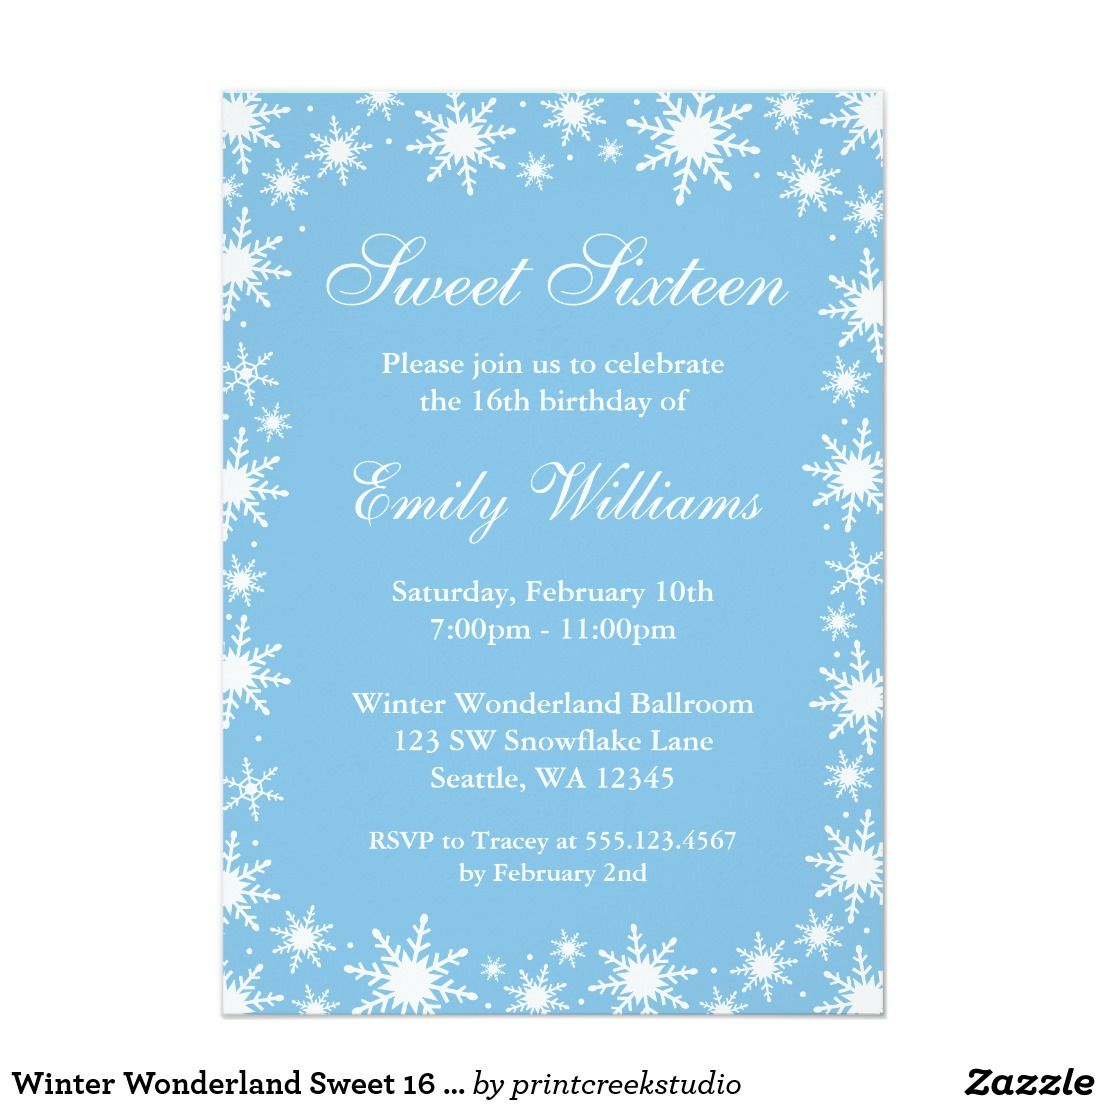 Winter Wonderland Sweet 16 Birthday Party Card | Sweet 16 birthday ...